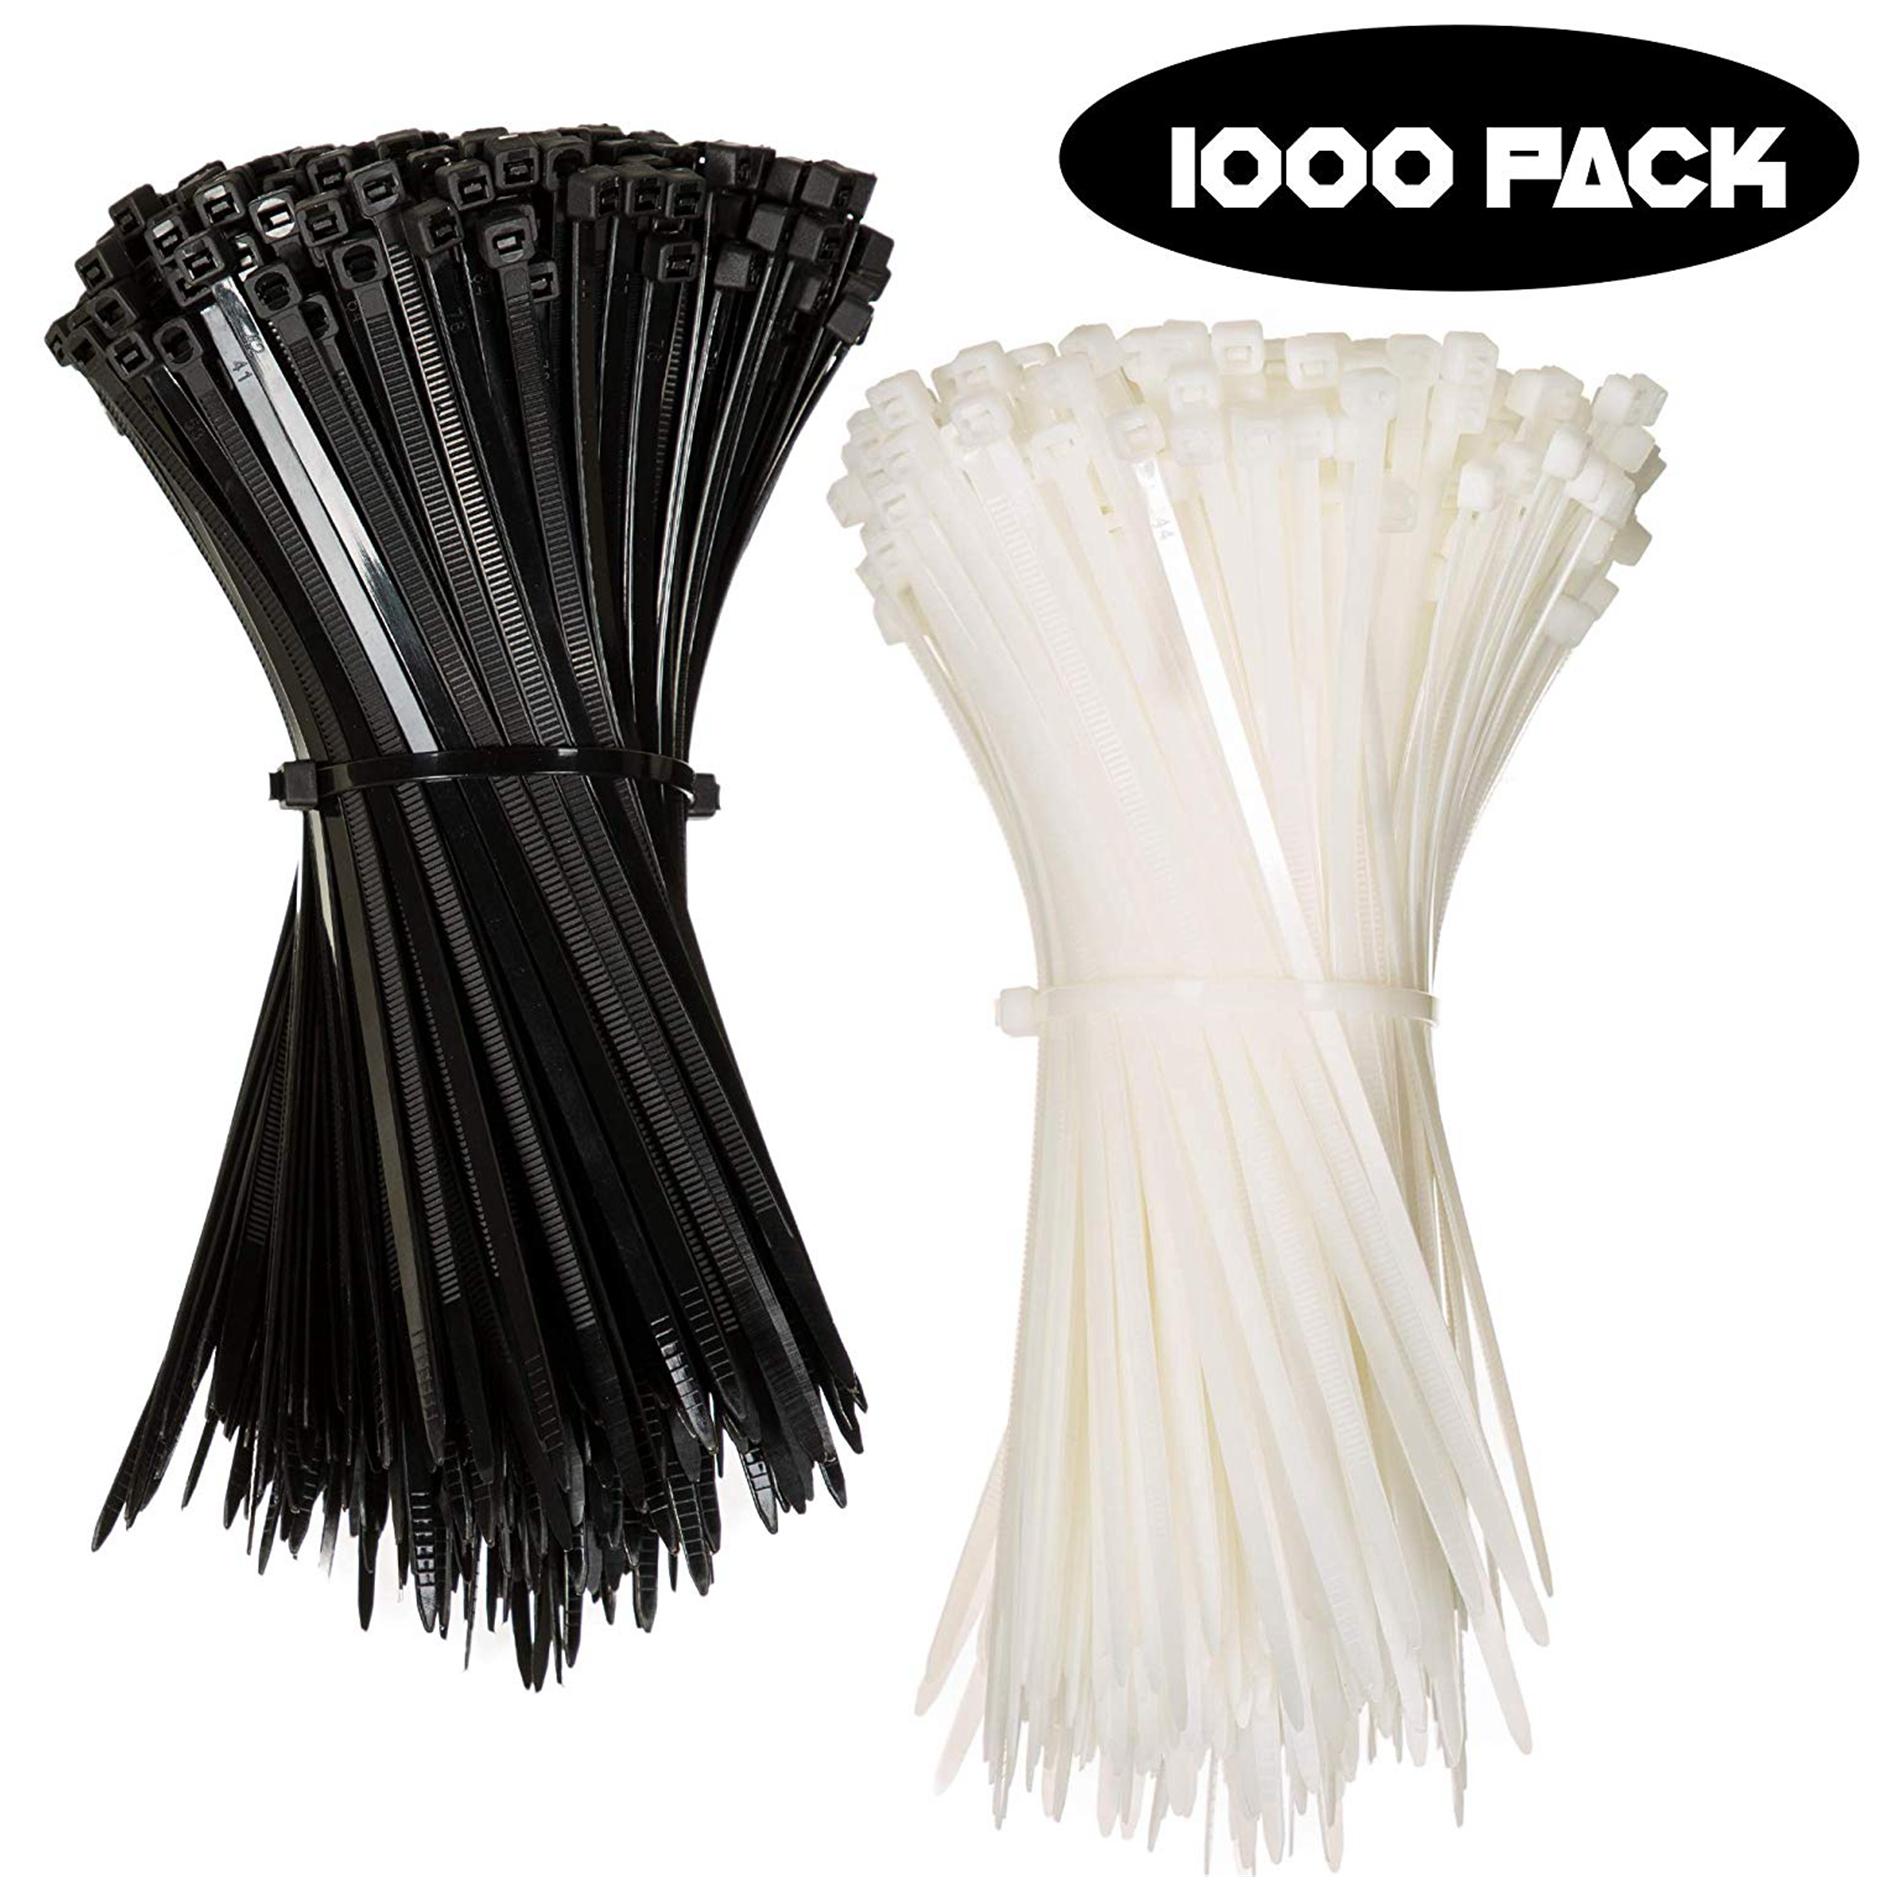 Hampool Wholesale 2.5x200mm Self Locking Black Cable Tie